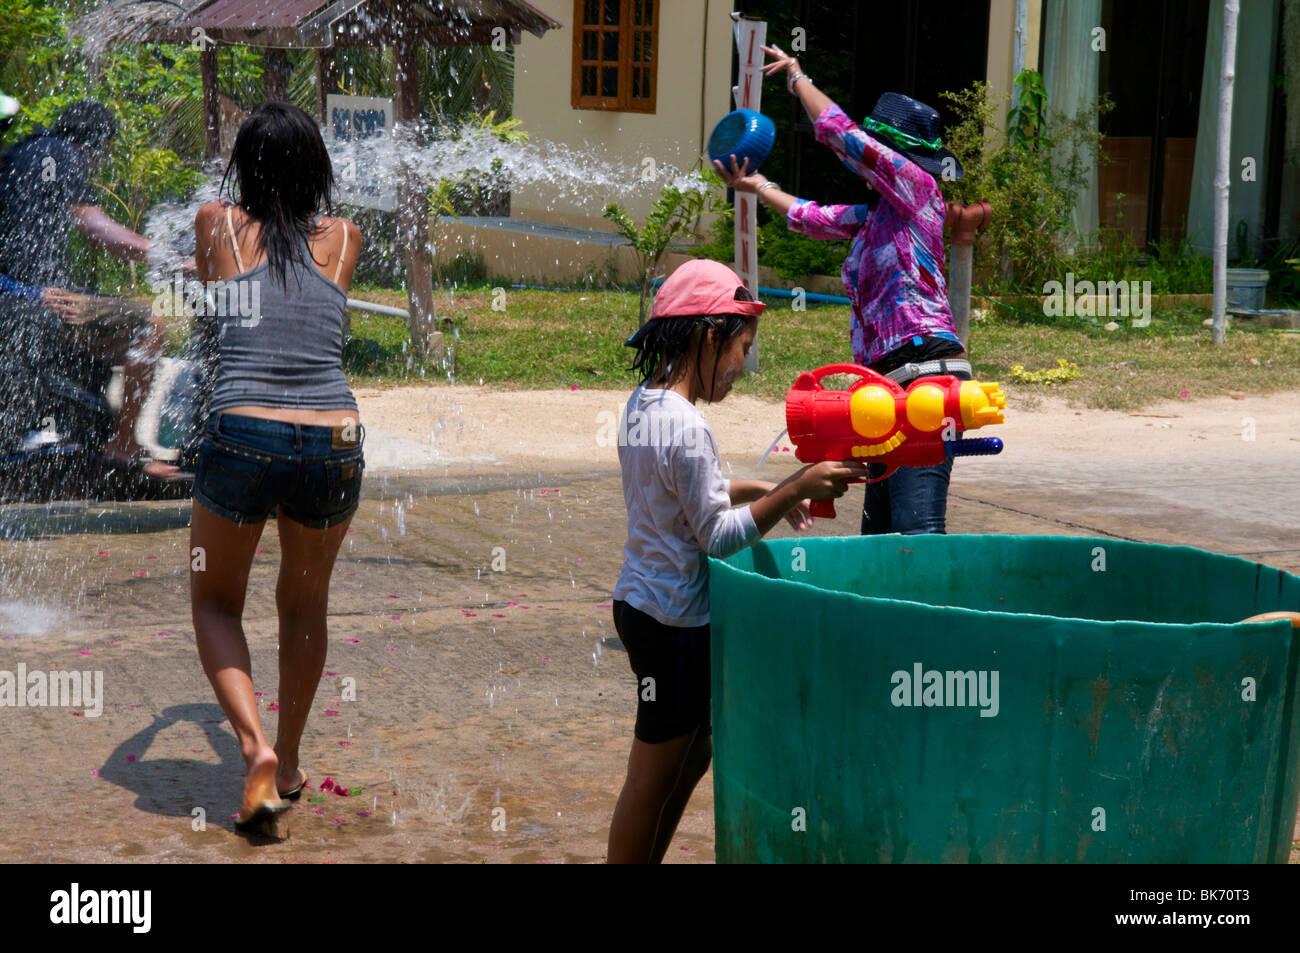 Tossing water at Songkran Festival Koh Phangan Thailand - Stock Image